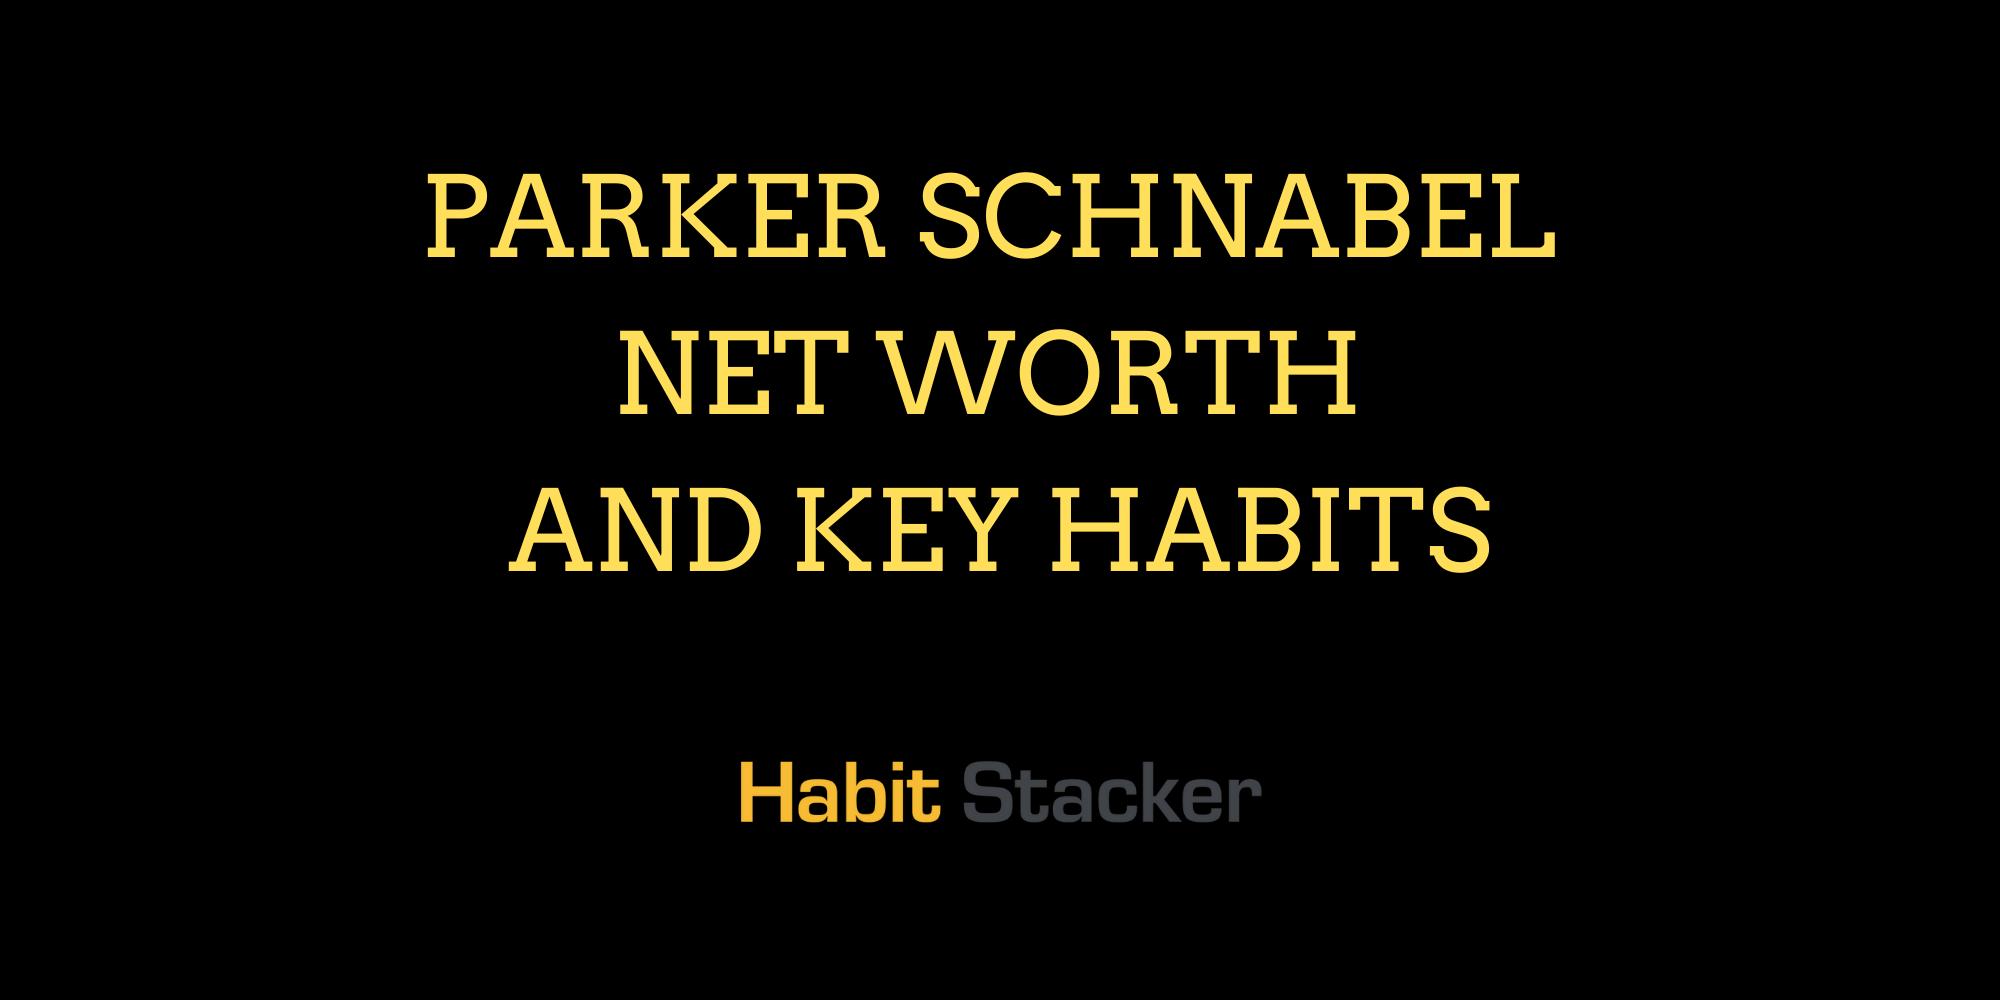 Parker Schnabel Net Worth and Key Habits